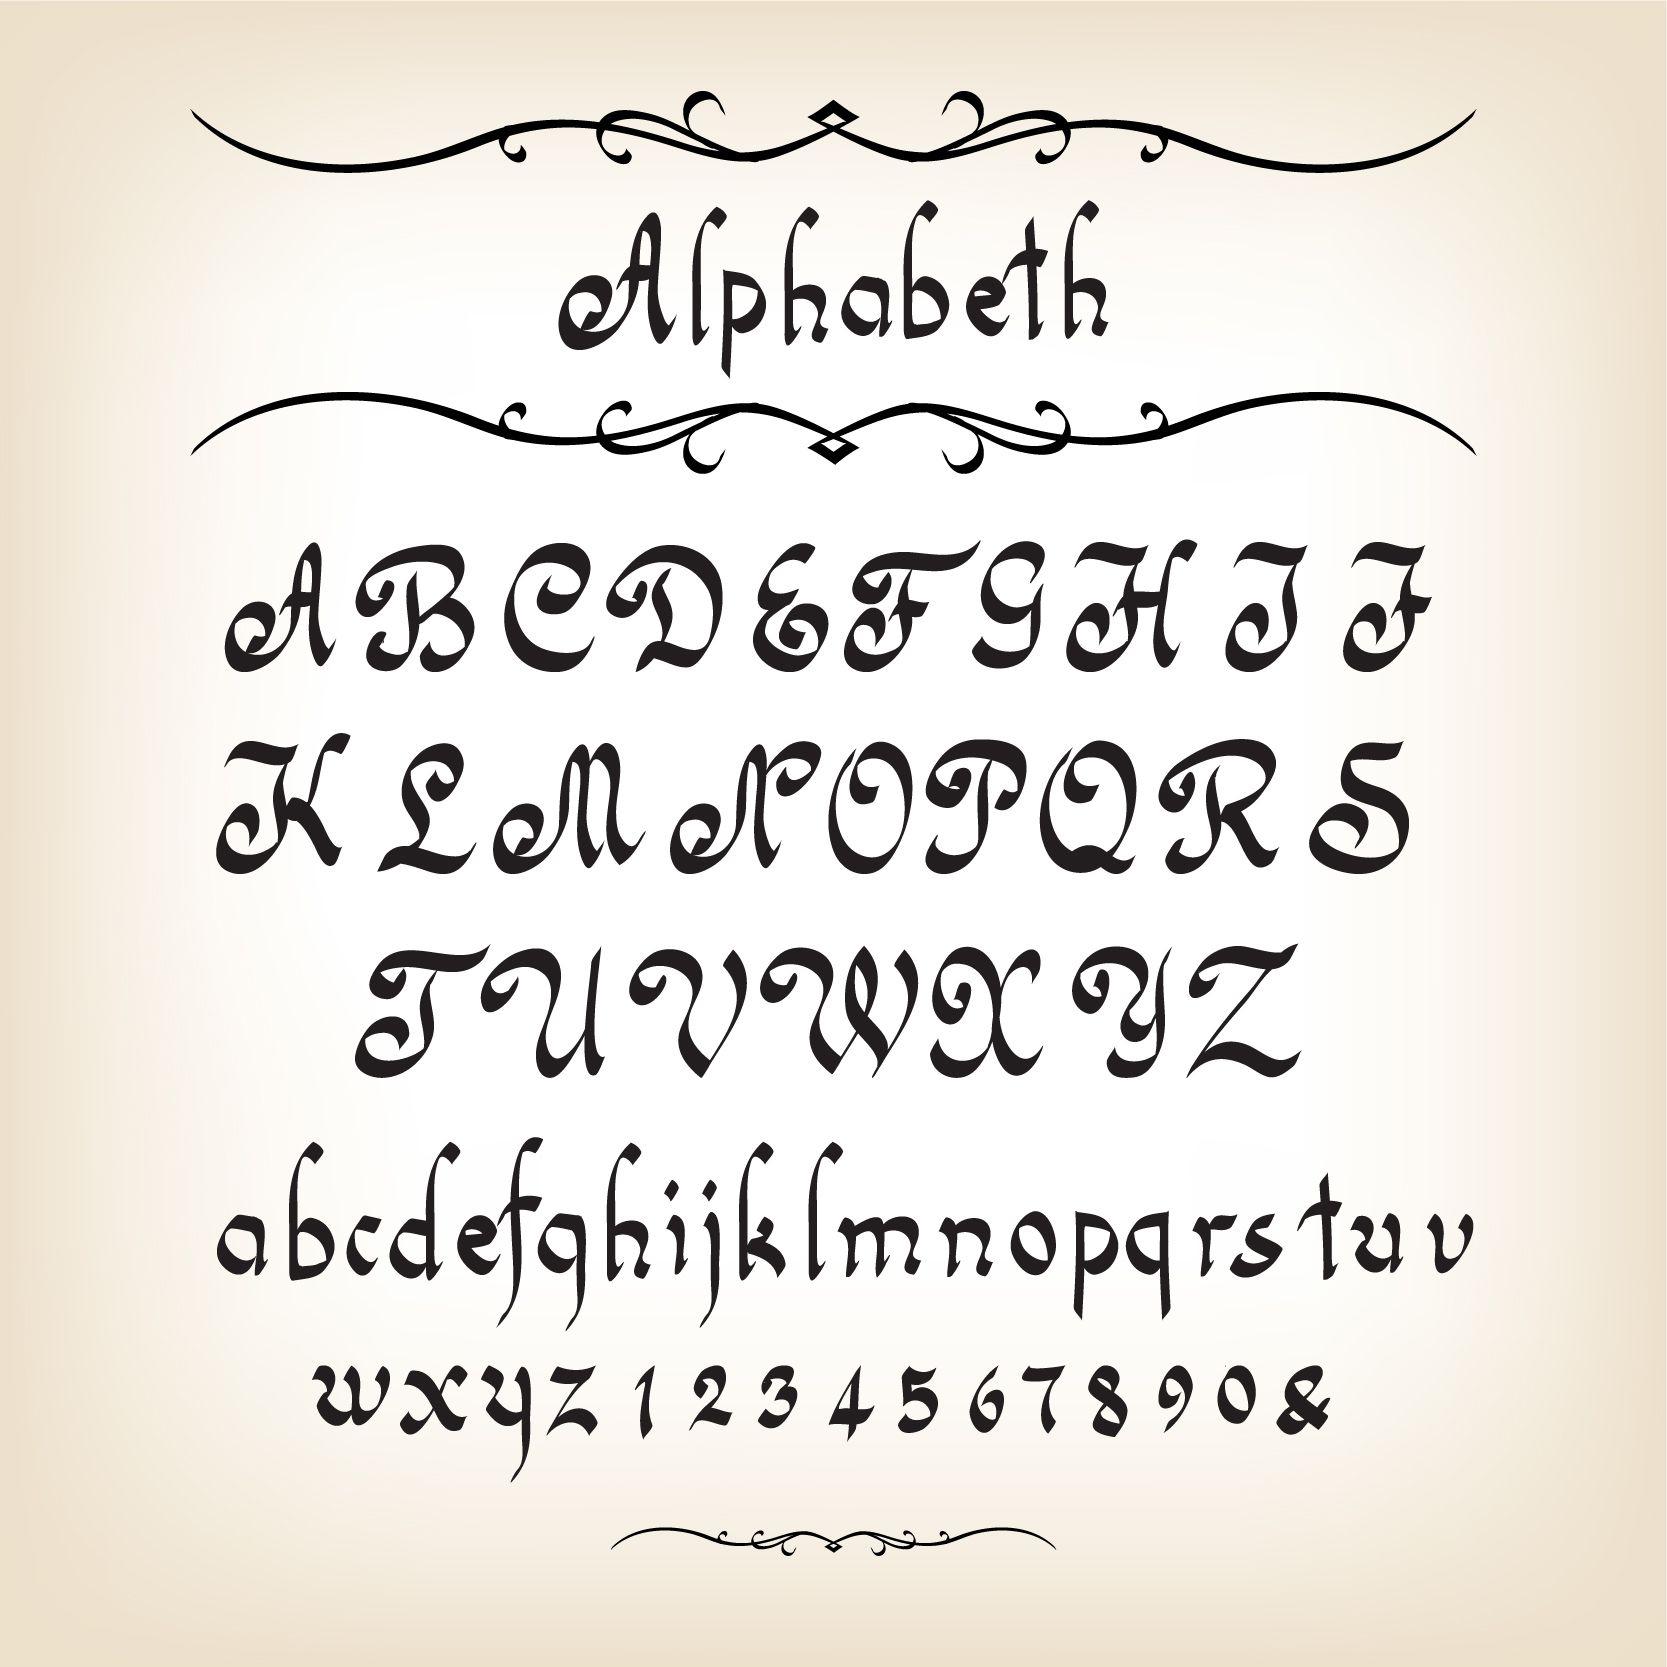 Cute alphabet fonts hand drawn alphabets design vector